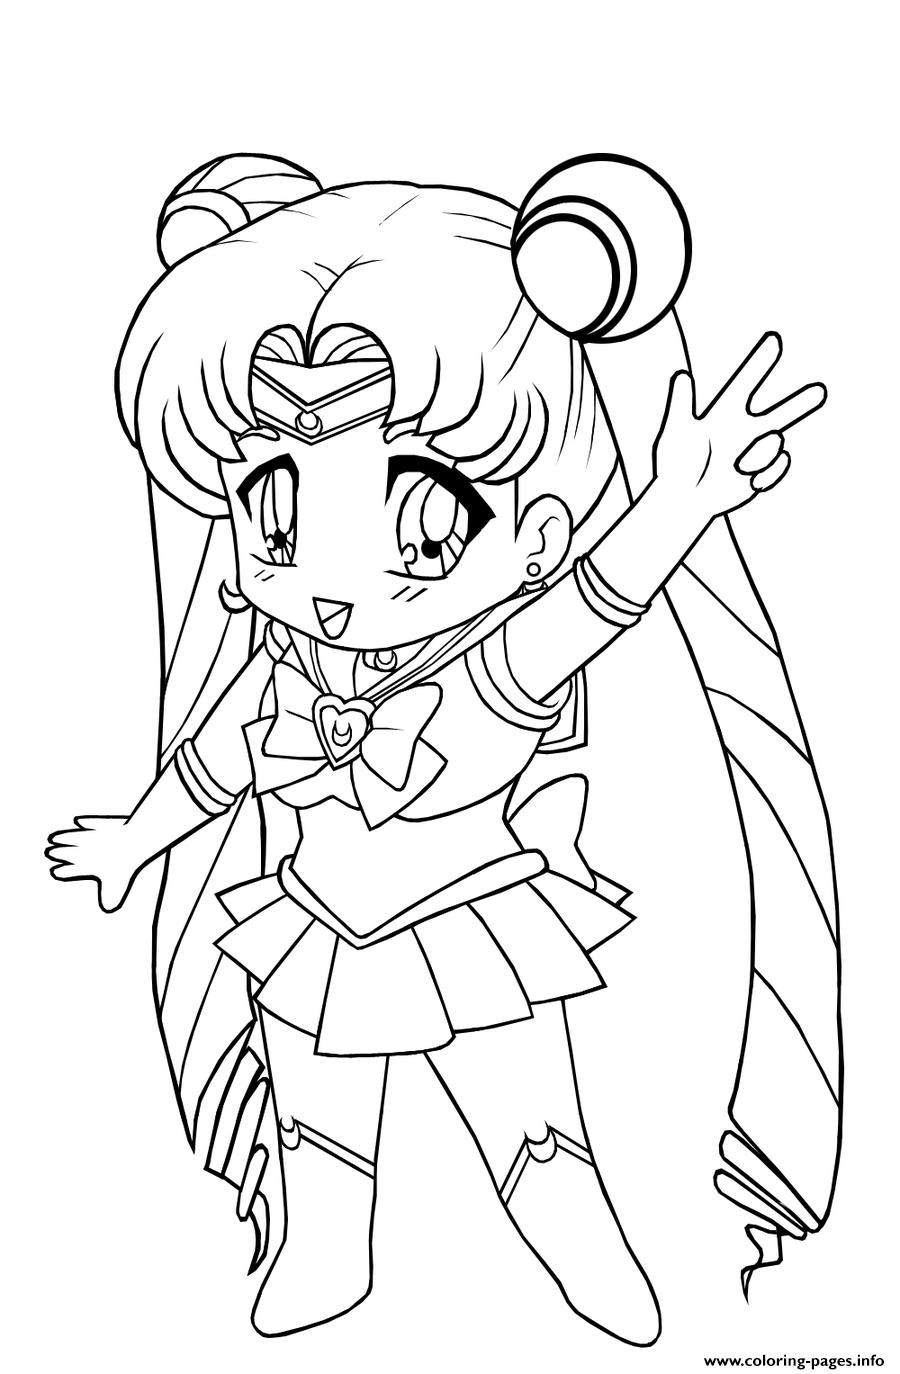 Kids Anime Girl S To Print De5bs Coloring Pages Printable